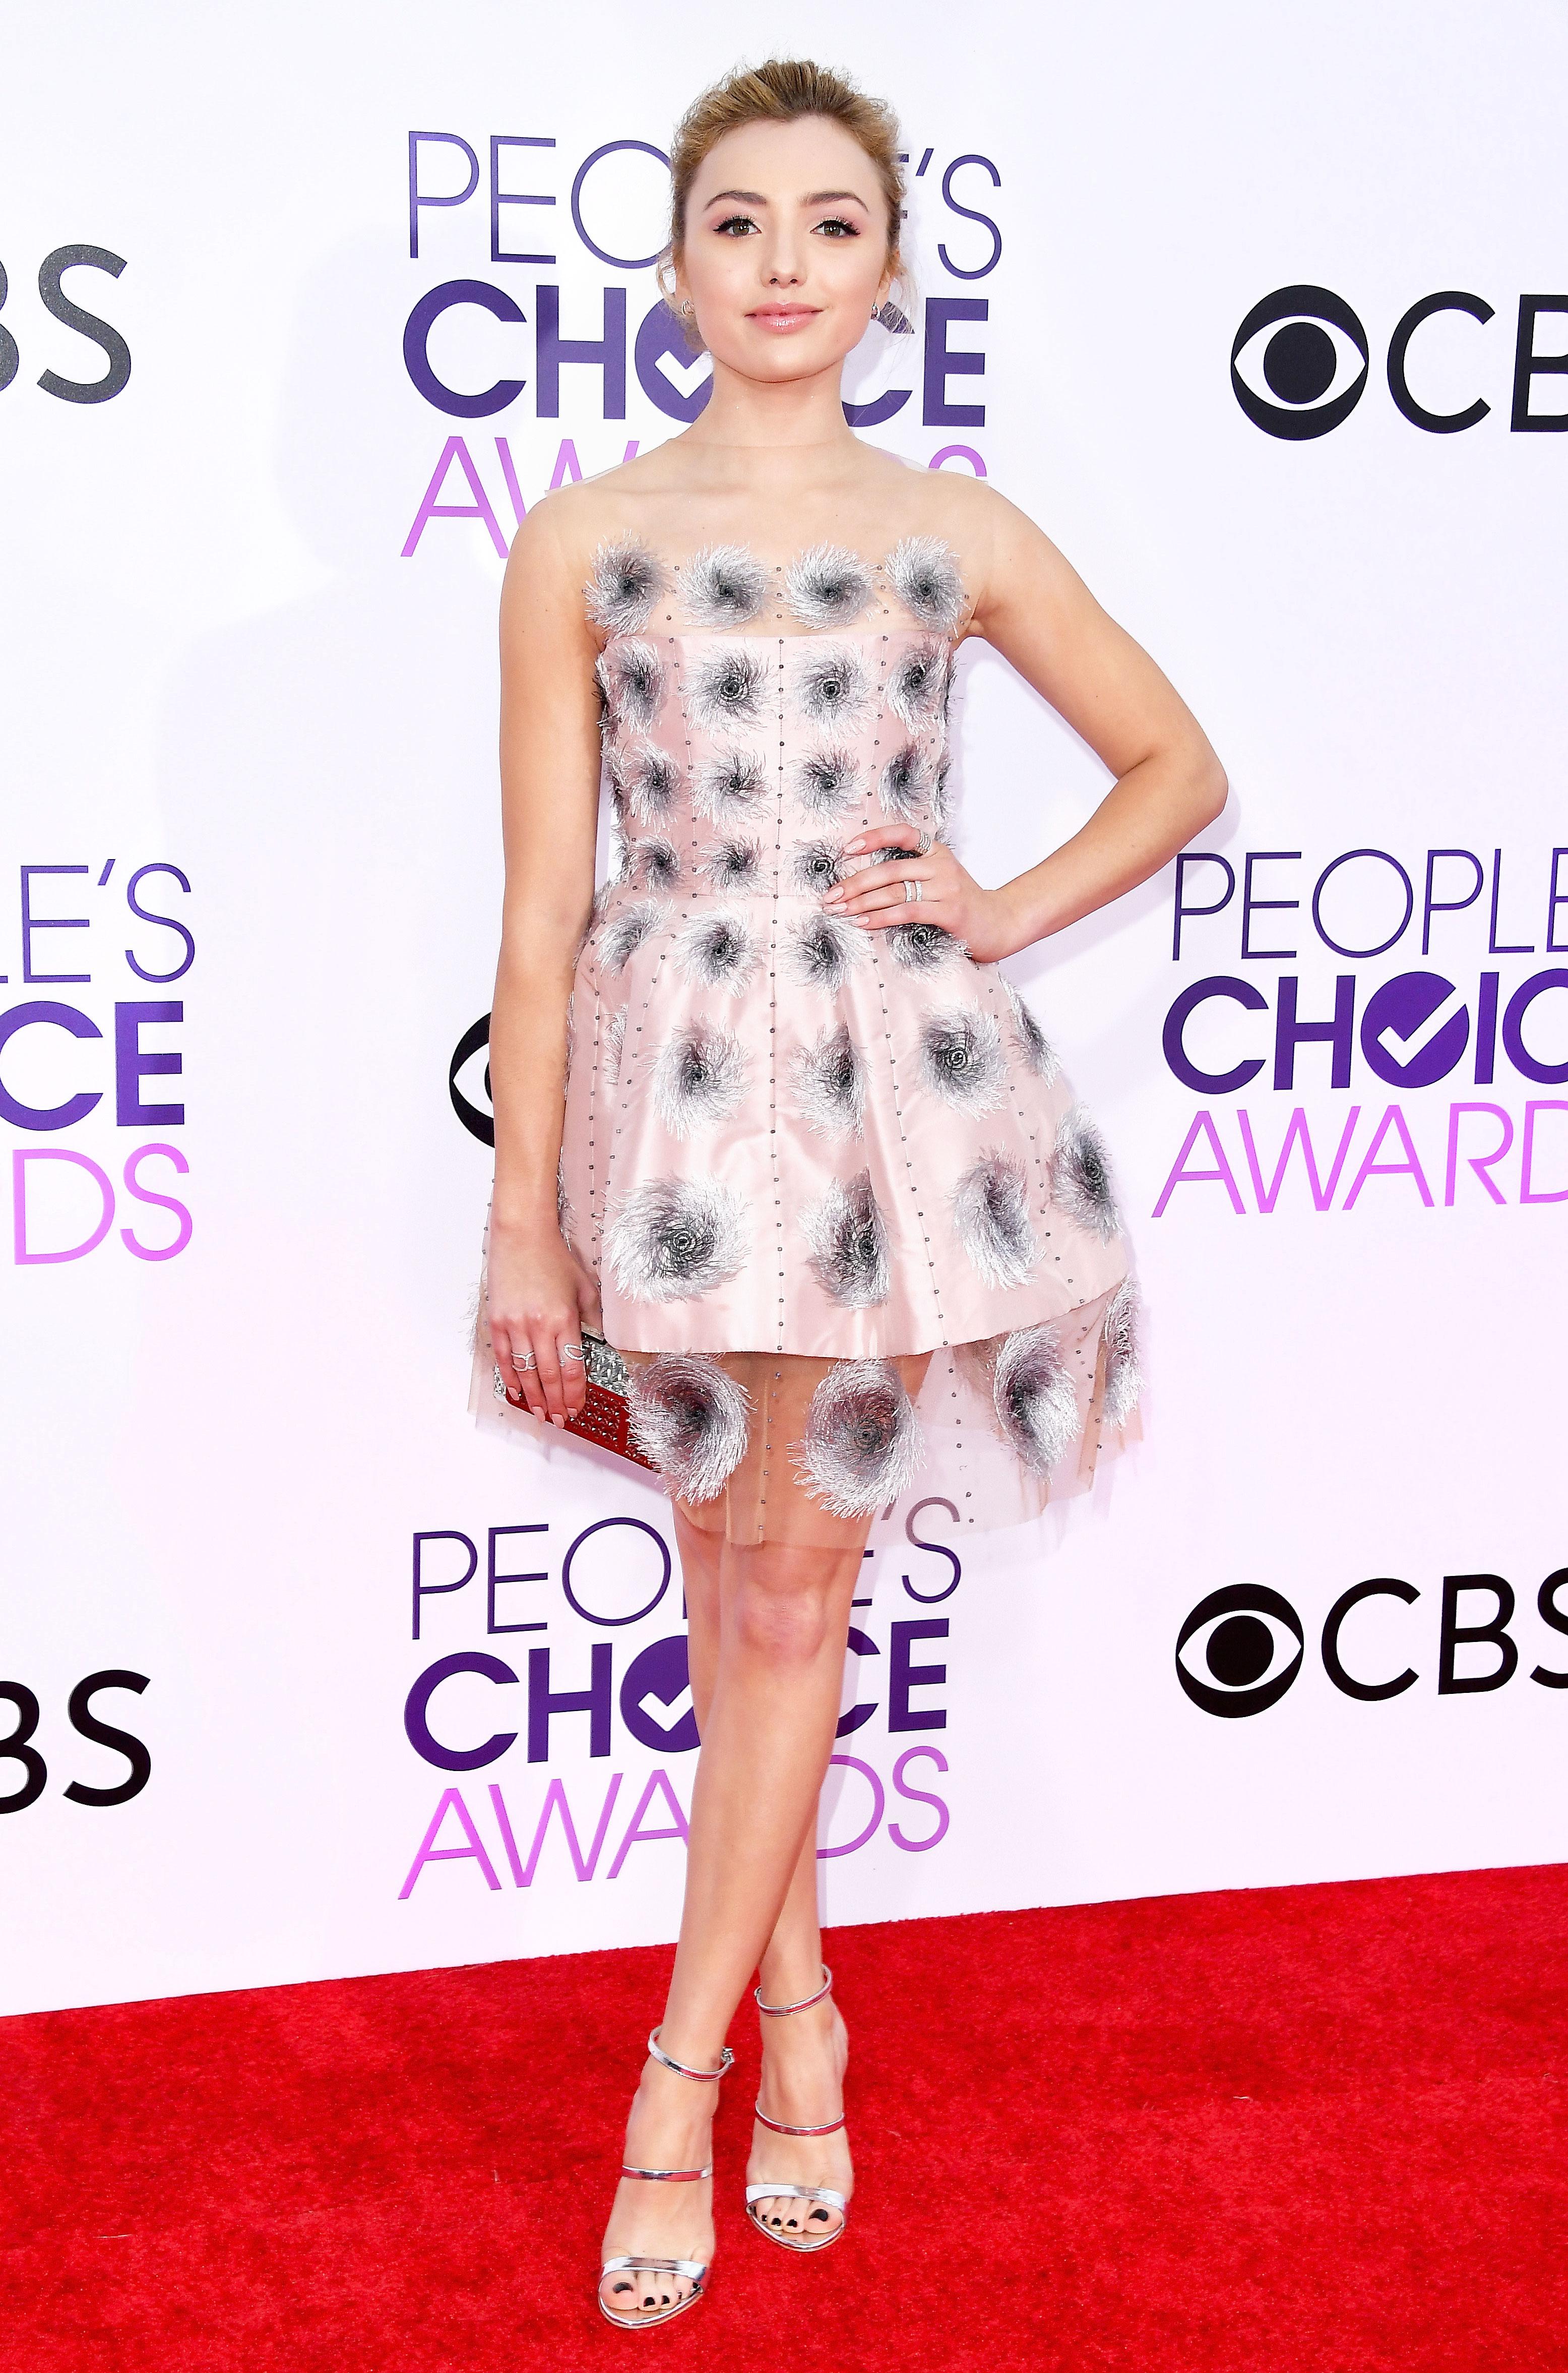 People S Choice Awards 2017 Best Dressed Stars